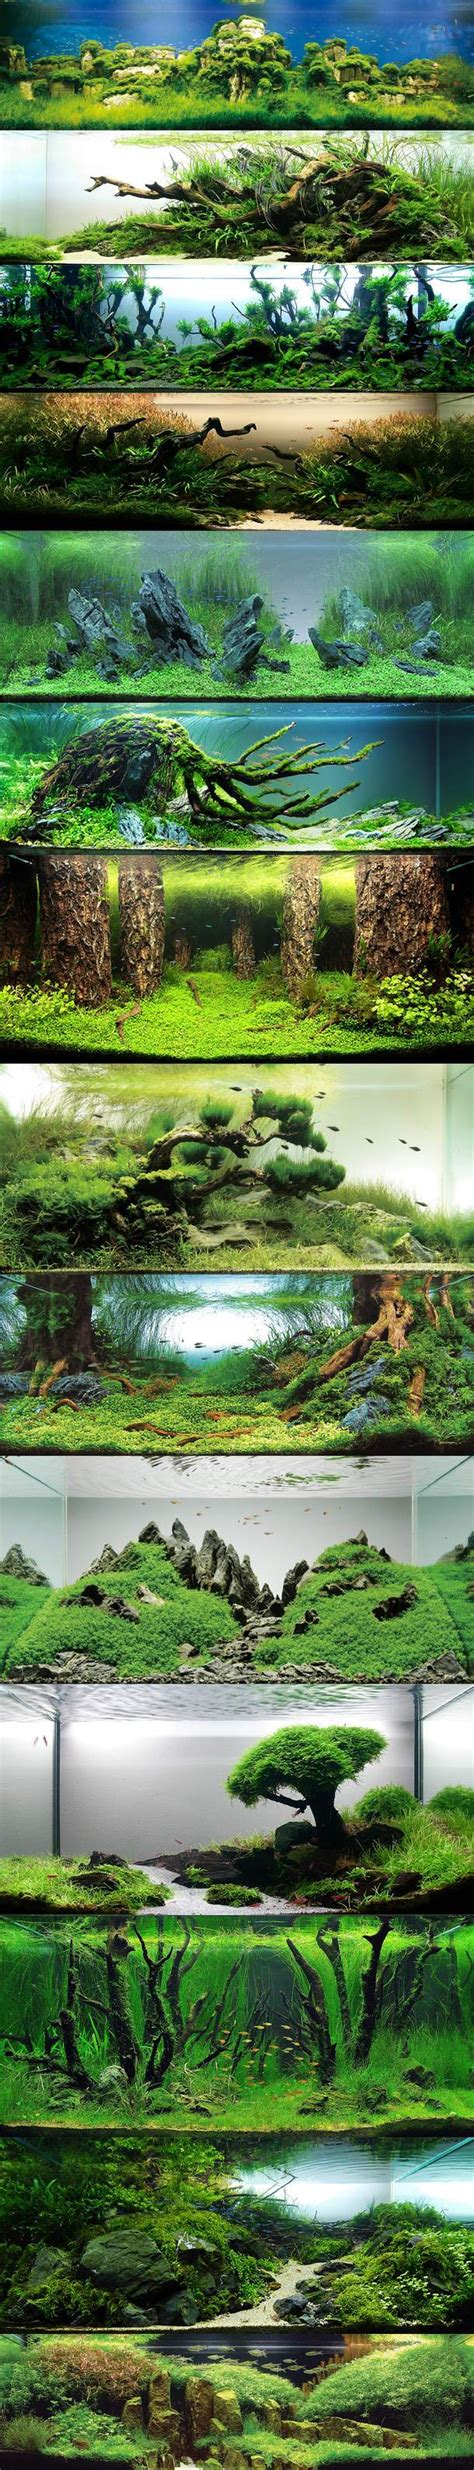 Fan Diy Aquascape Tank 30 70 Aquascape Build Your Own Micro Ecosystem Cool Steemit